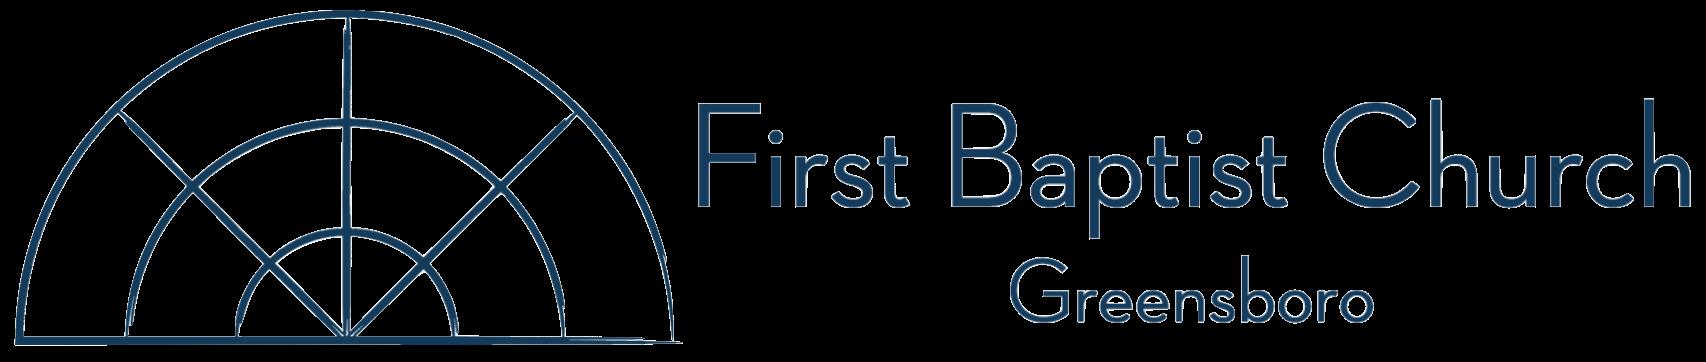 First Baptist Church Greensboro